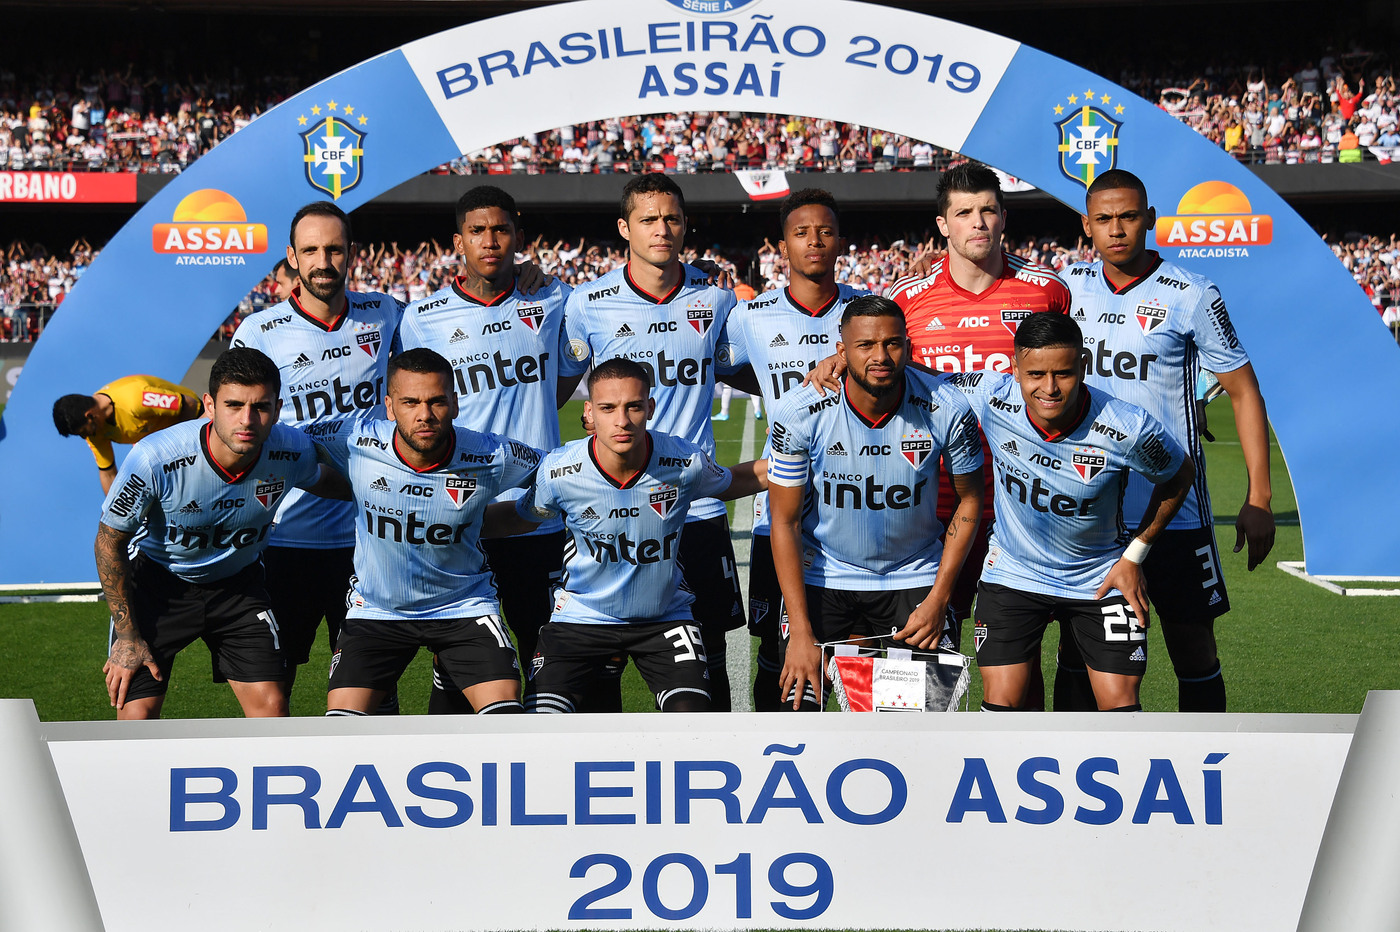 Sao-Paulo-Athletico-Paranaense-pronostico-10-novembre-2019-analisi-e-pronostico